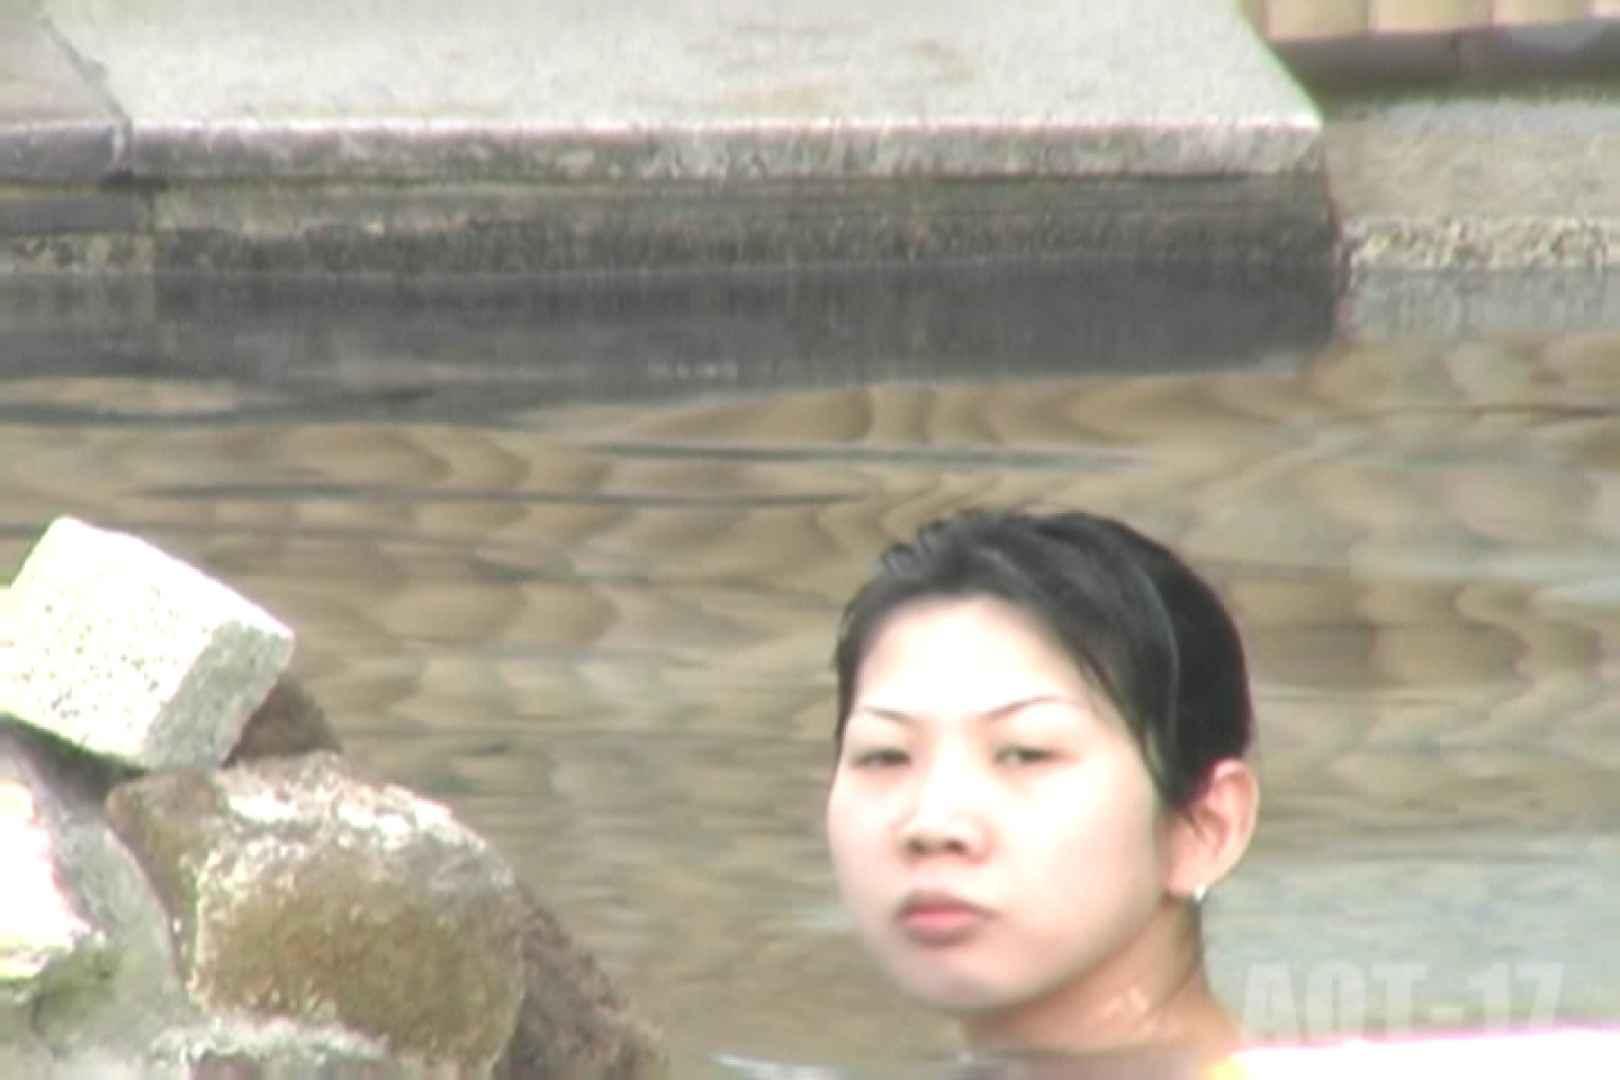 Aquaな露天風呂Vol.850 OLのエロ生活 | 露天風呂  76連発 49